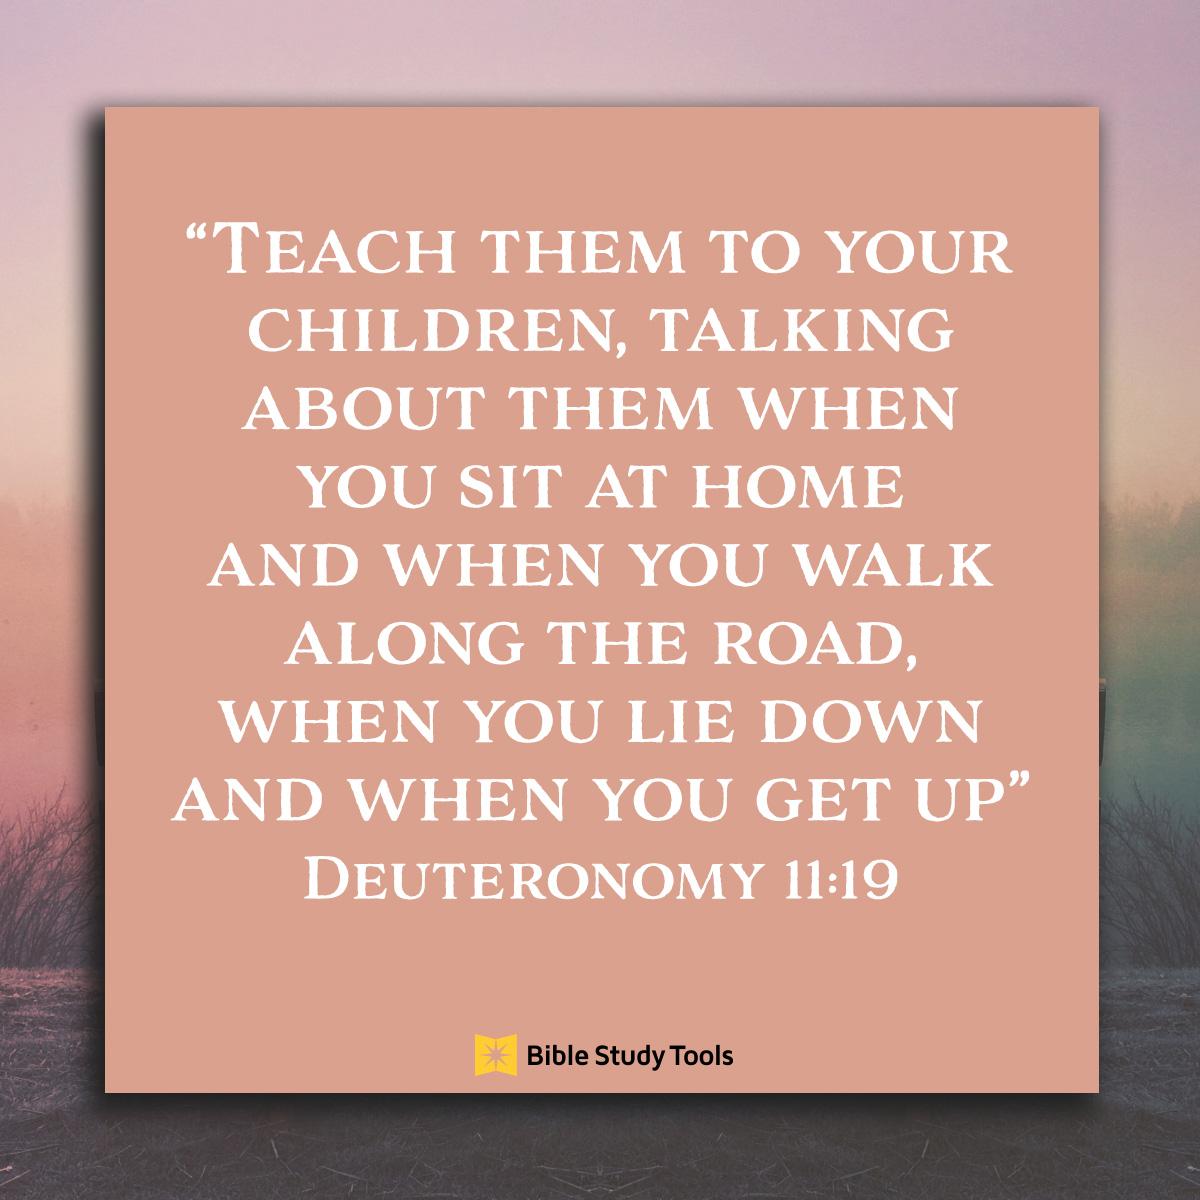 Deuteronomy 11:19, inspirational image